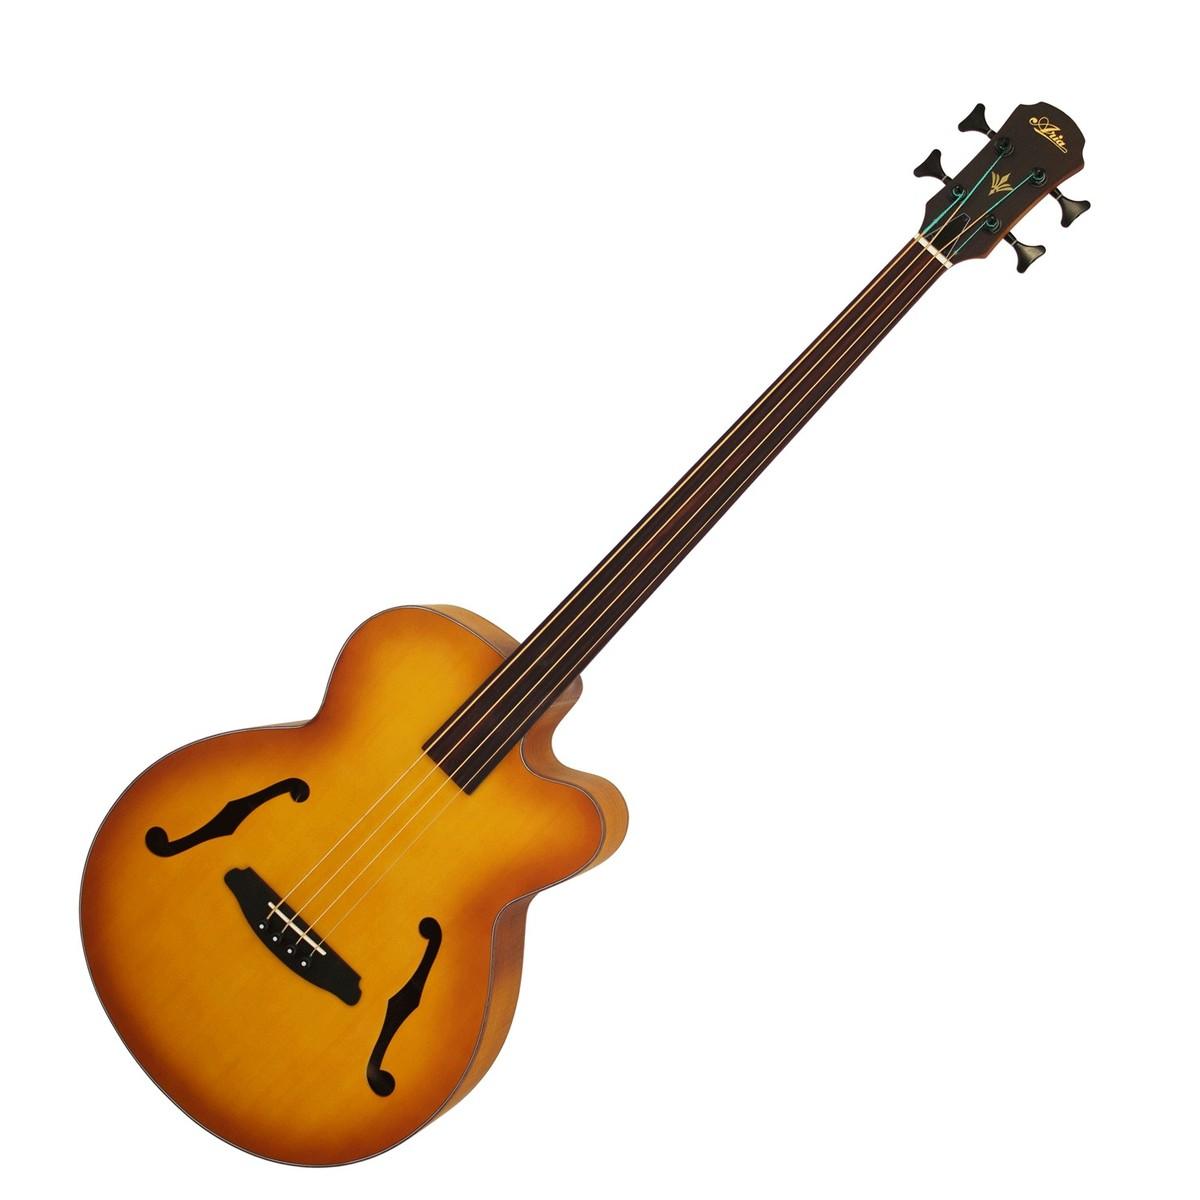 Image of Aria FEB Fretless Electro Acoustic Bass Guitar Light Vintage Burst